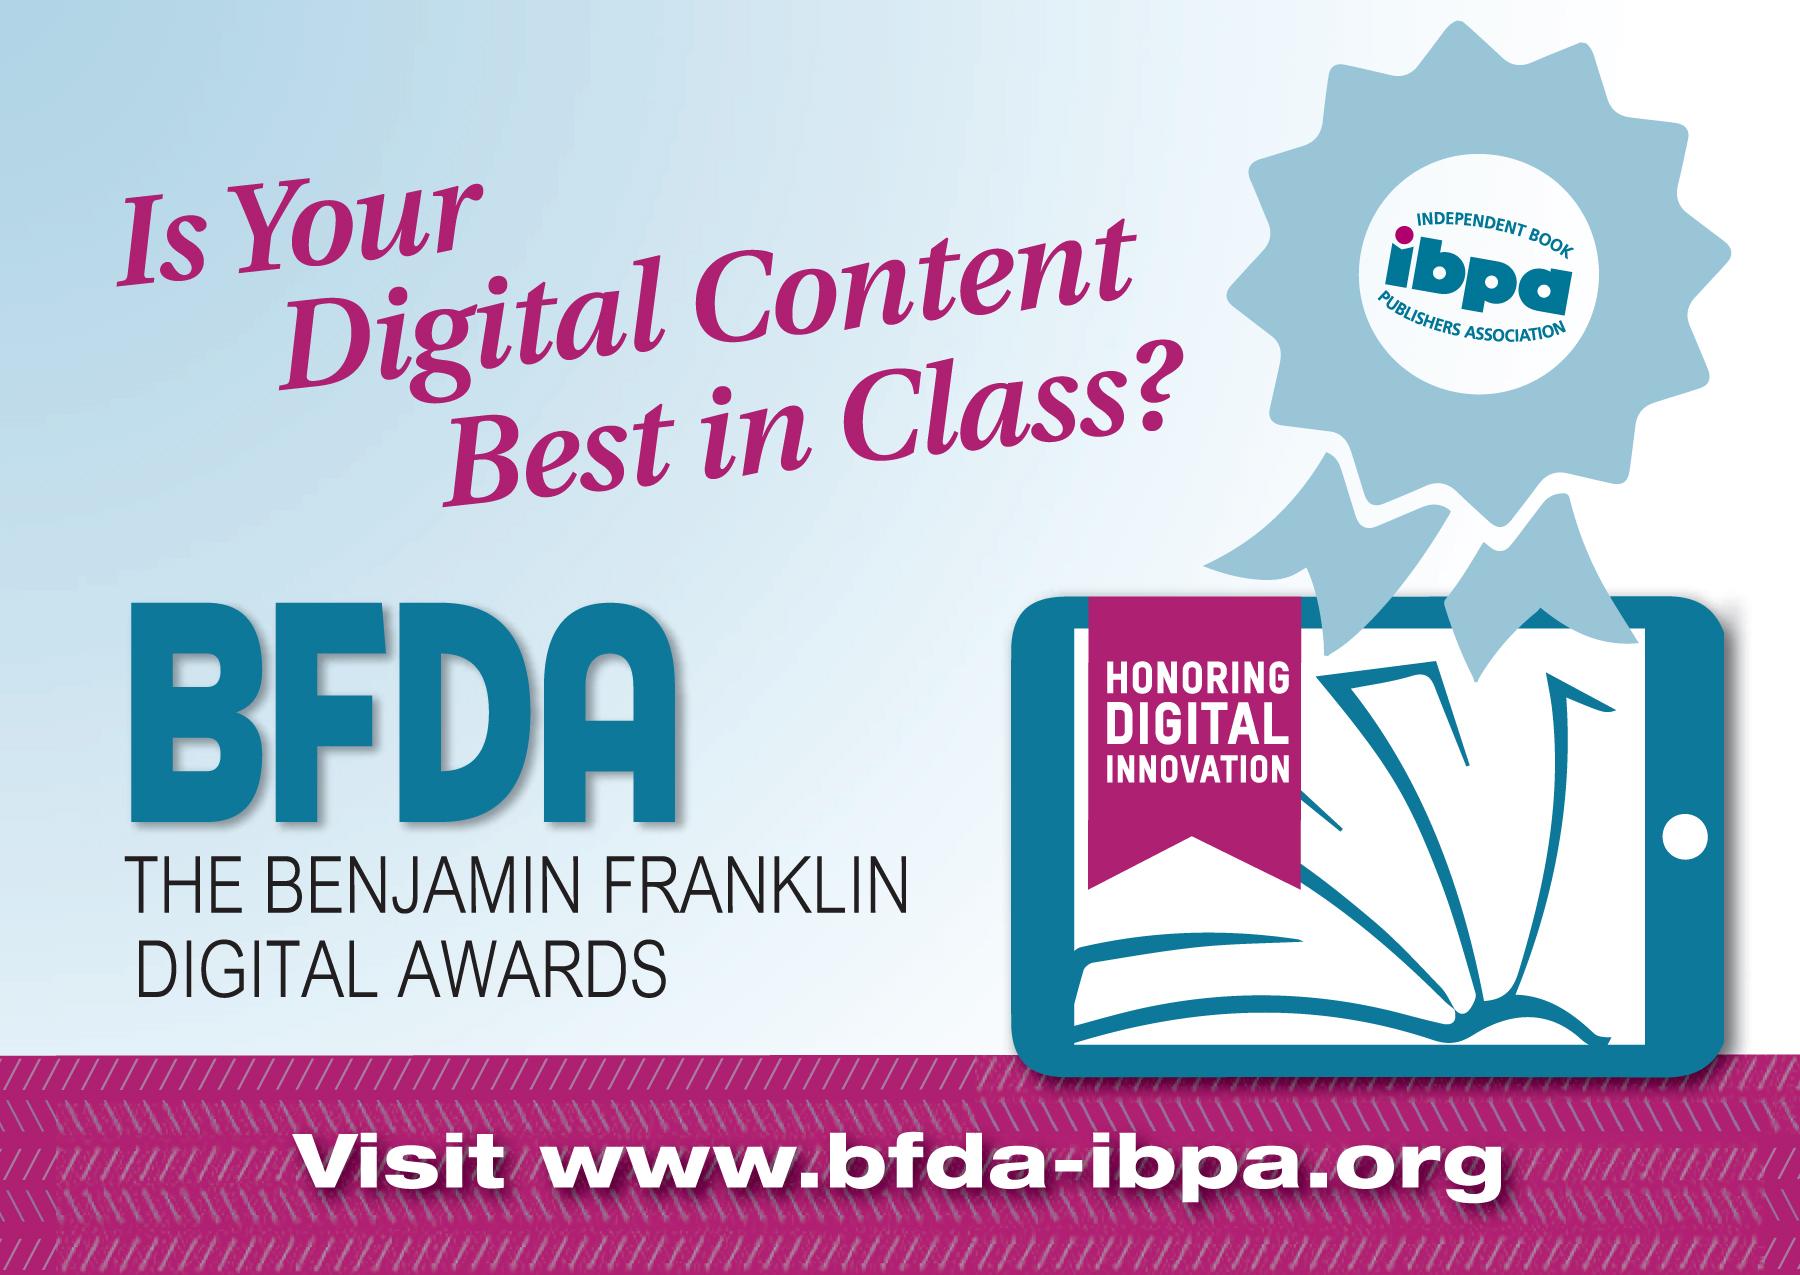 Benjamin Franklin Digital Award